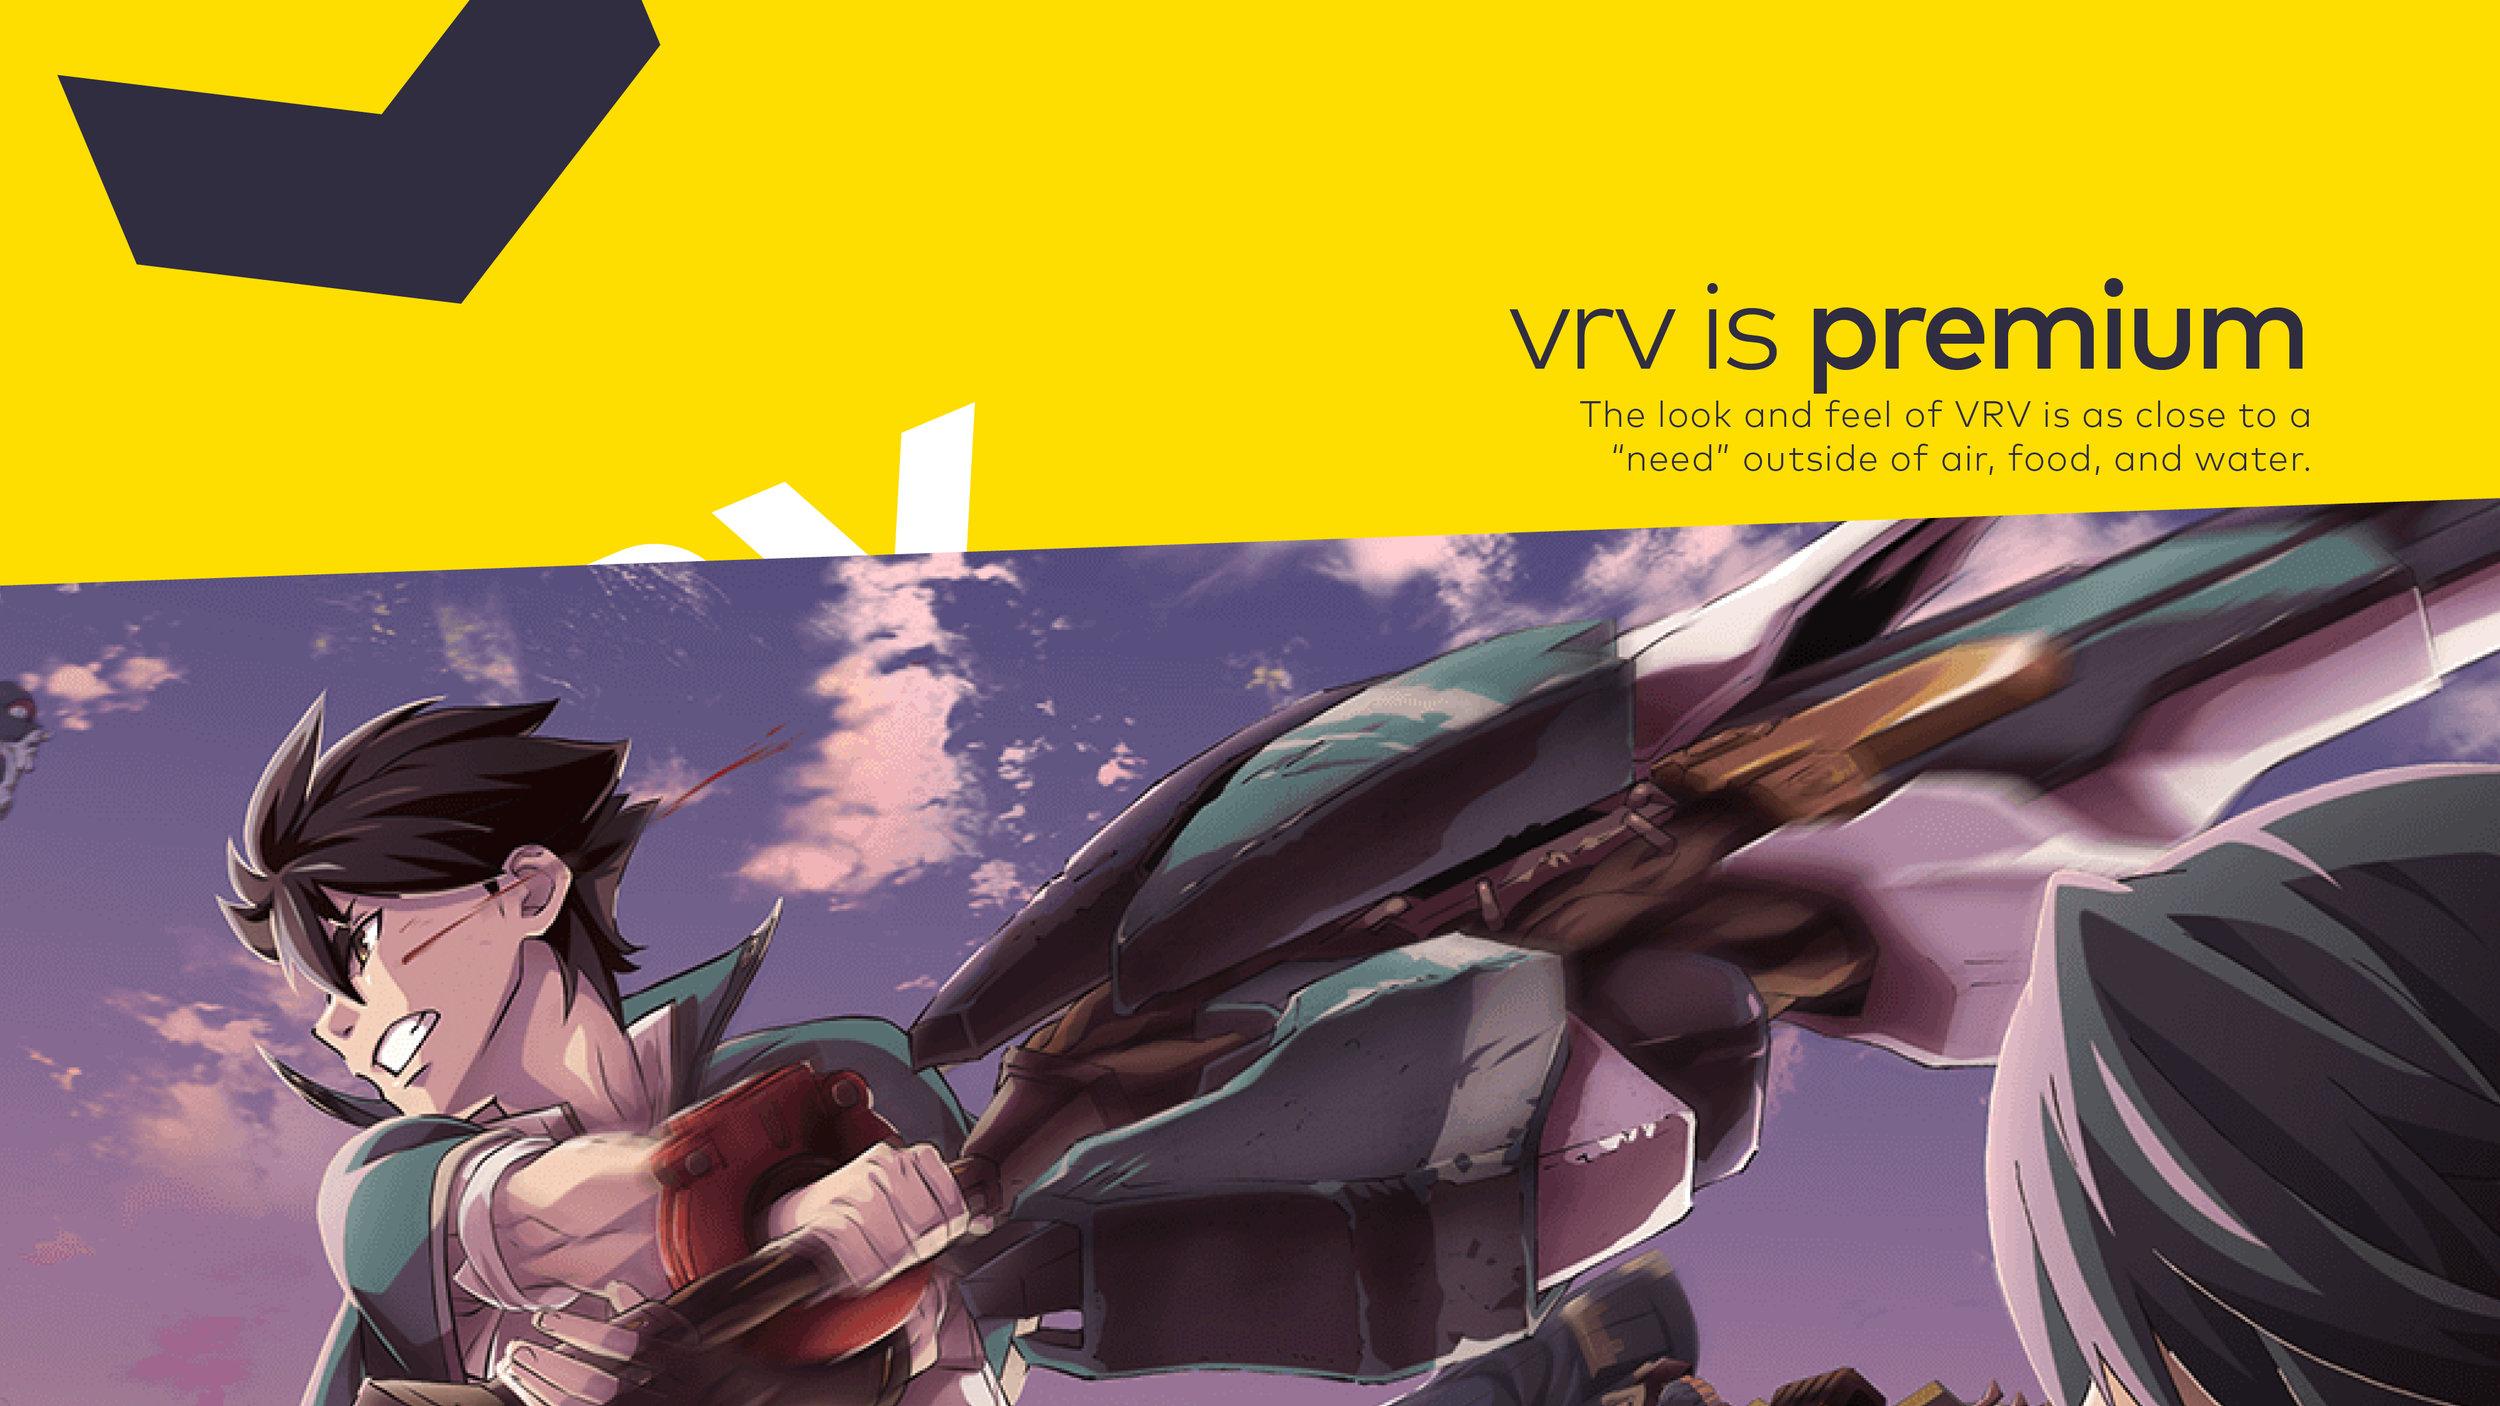 VRV_BrandBook_Alpha1_Deck_16x95.jpg